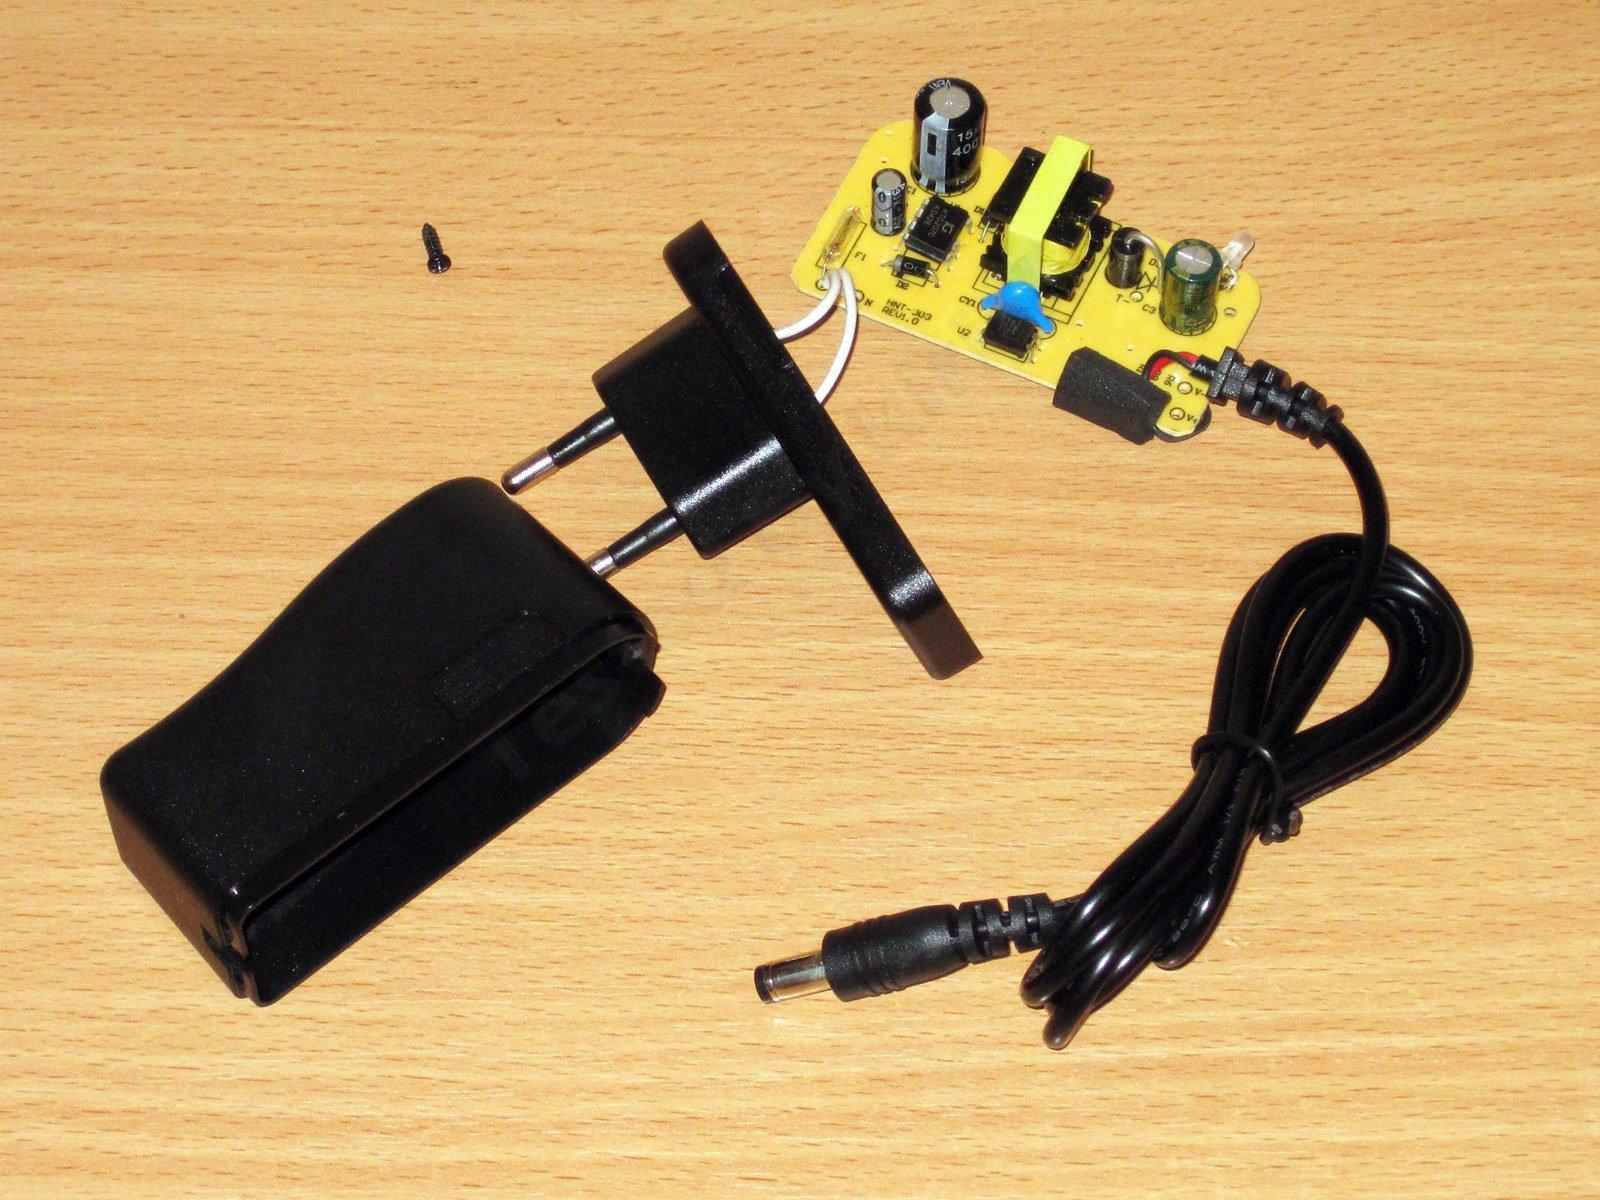 Зарядка для аккумуляторов 18650 своими руками фото 186